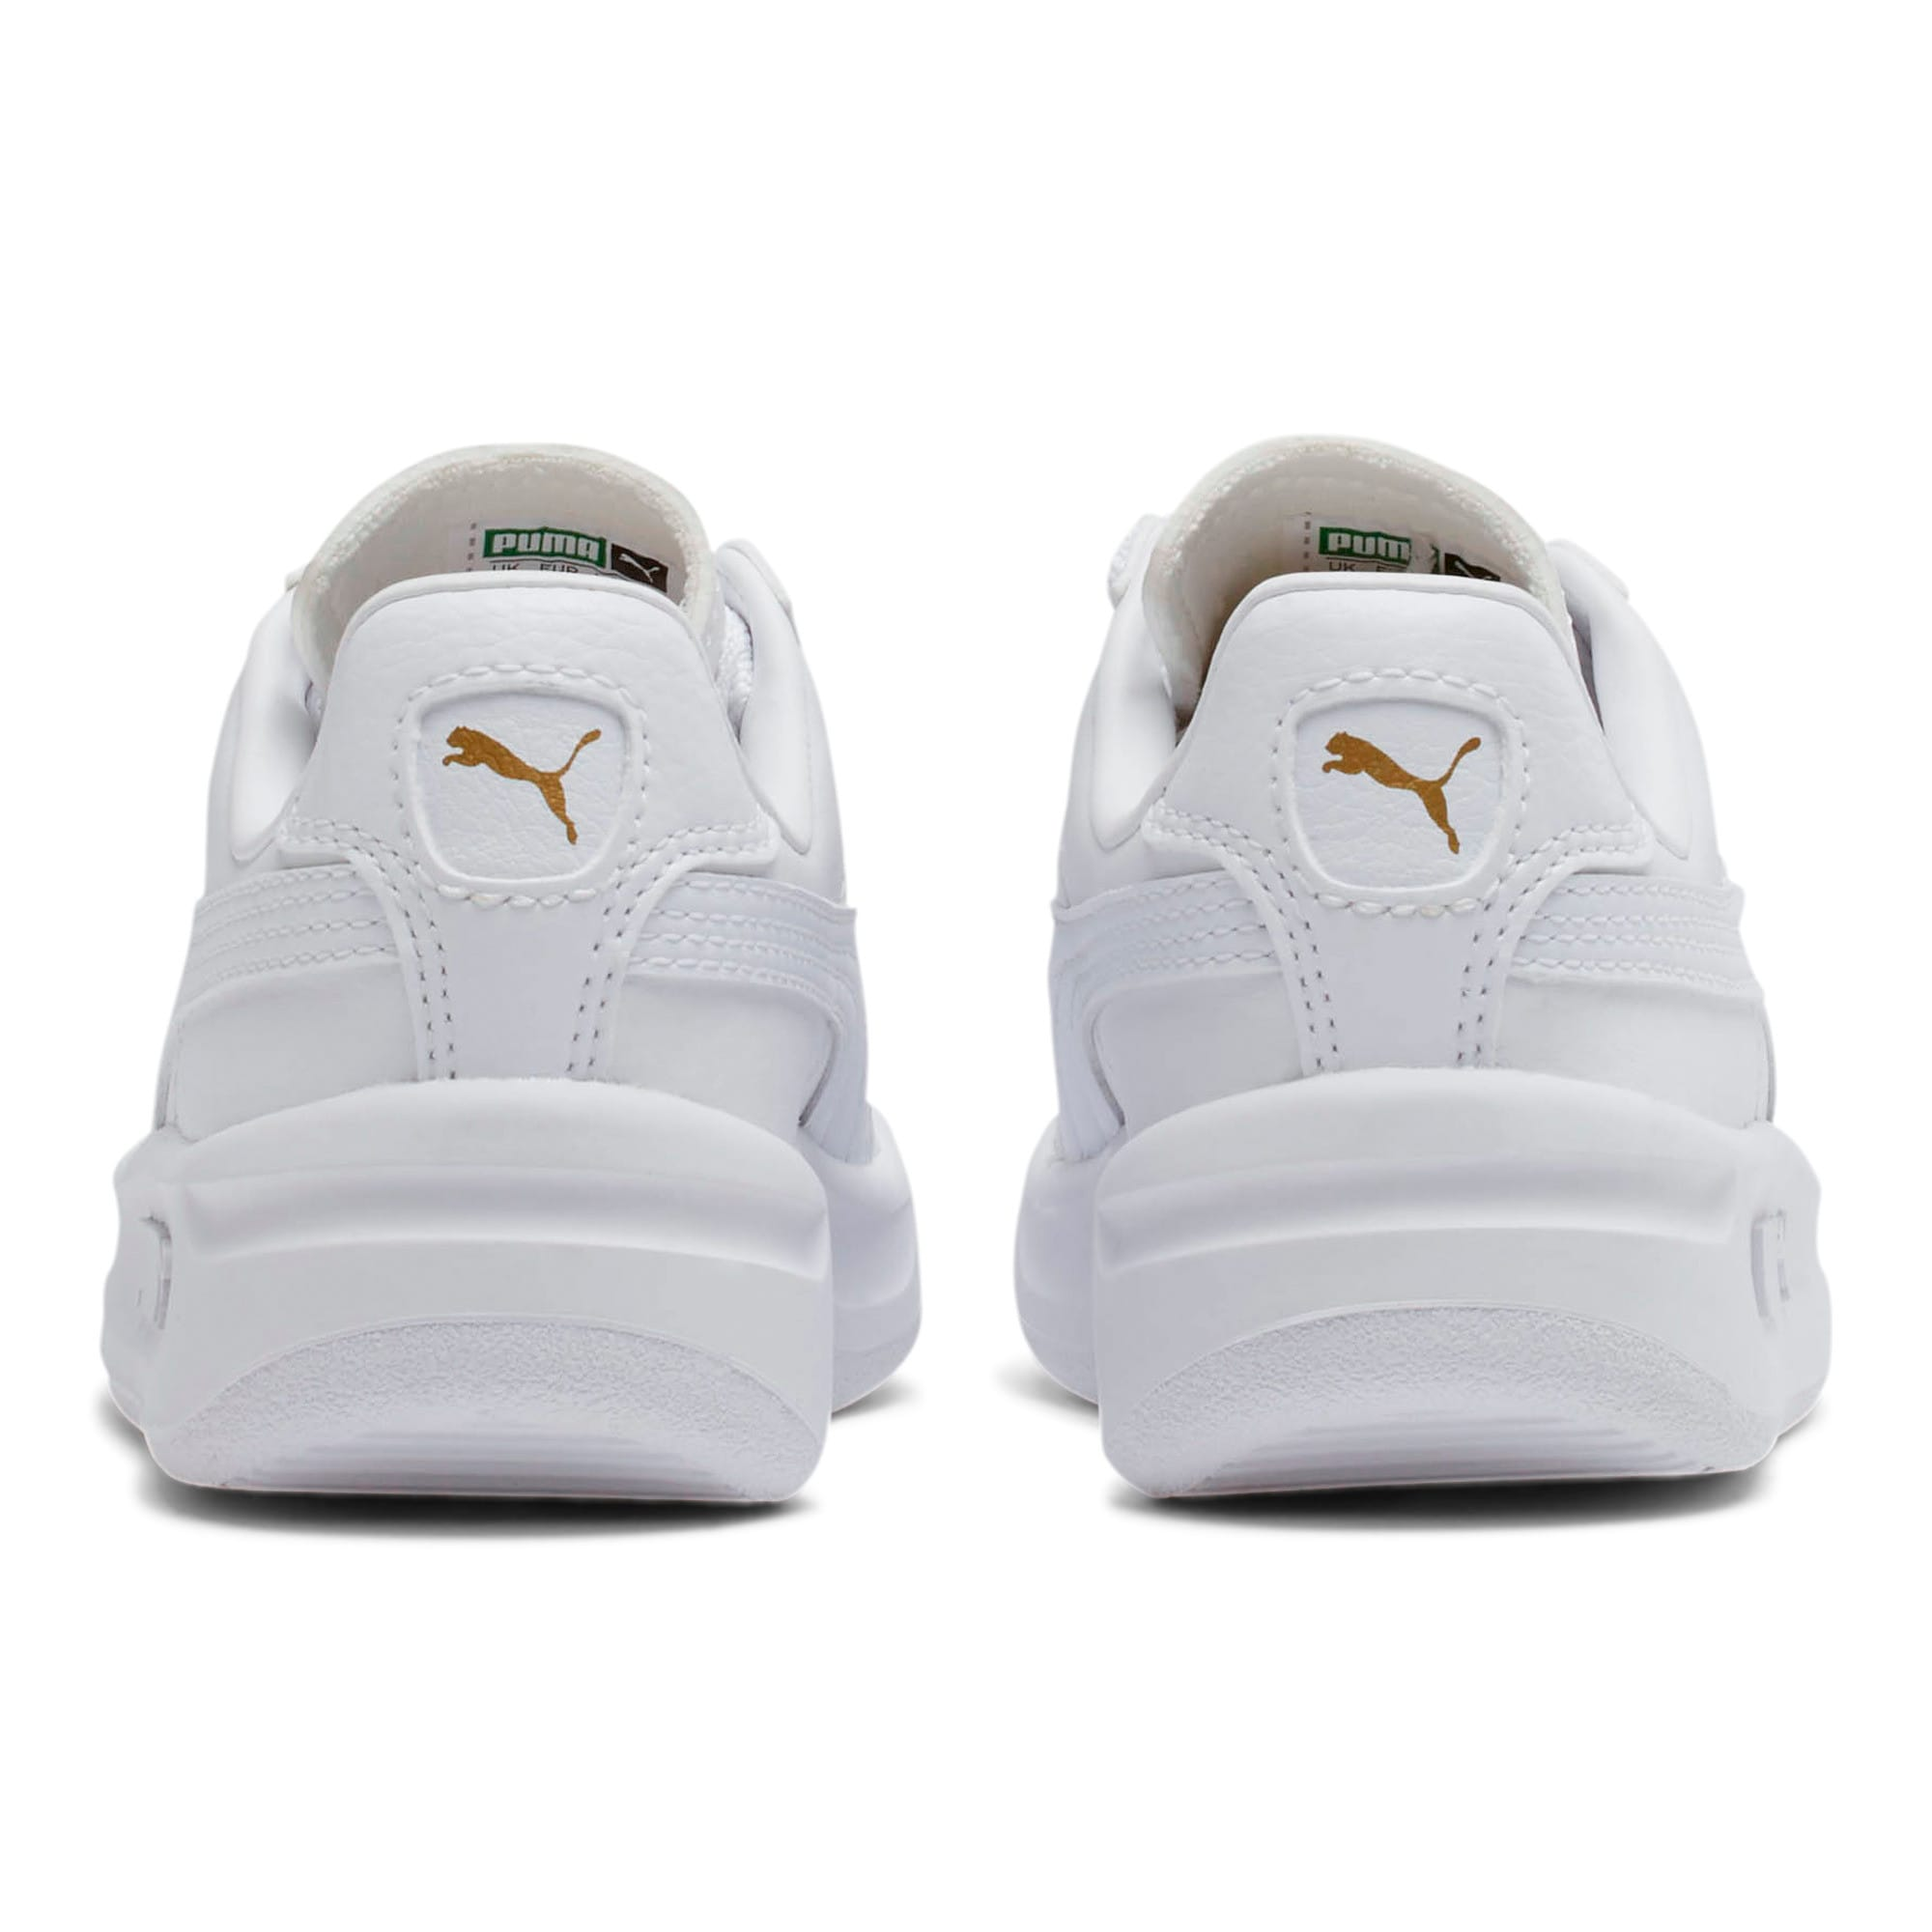 Thumbnail 3 of GV Special Little Kids' Shoes, Puma White-Puma Team Gold, medium